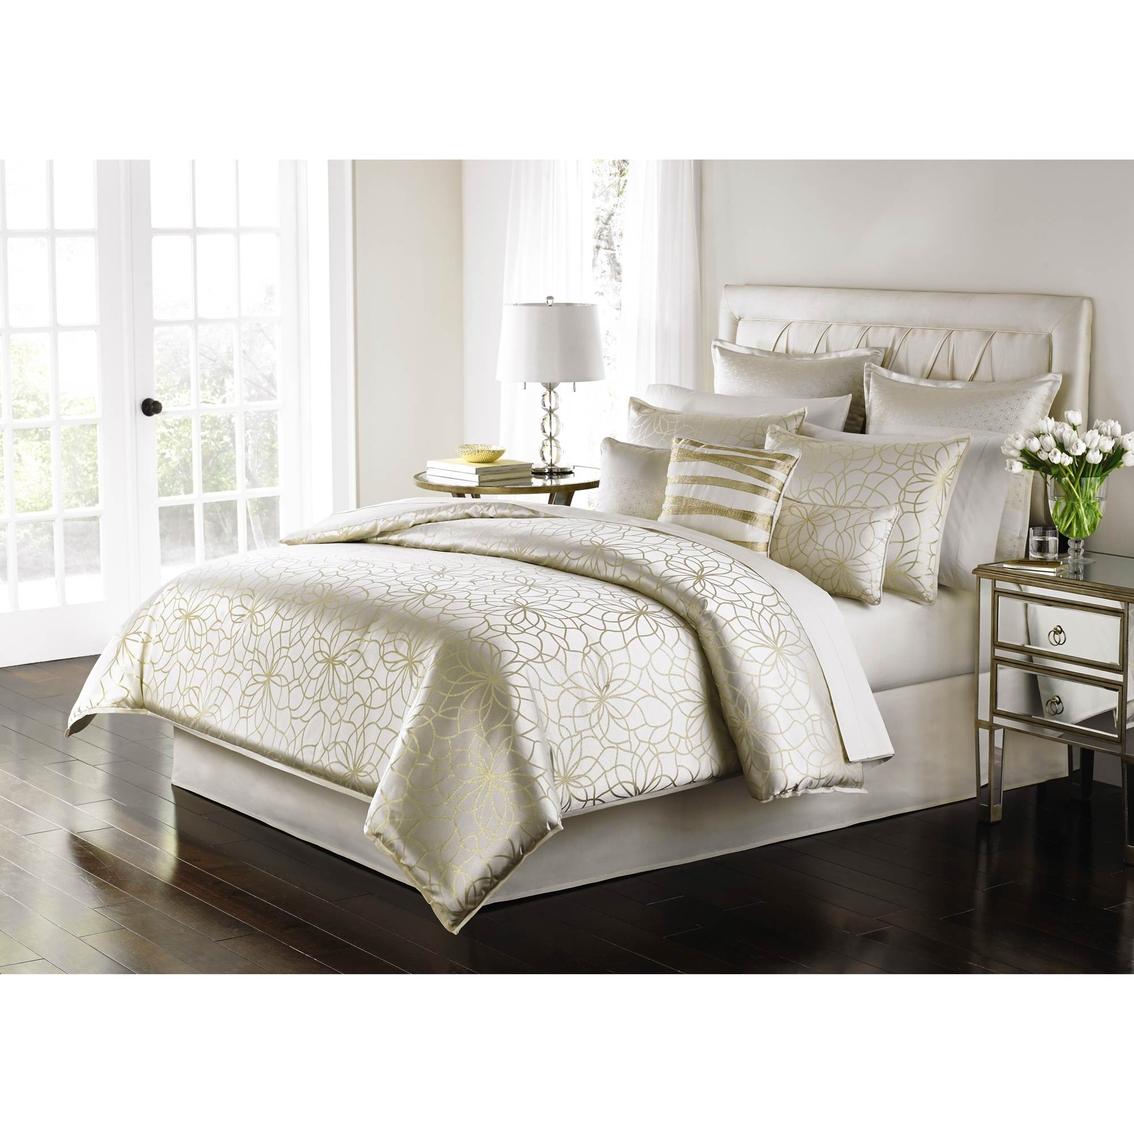 Martha Stewart Collection Radiant Day 9 Pc. Comforter Set